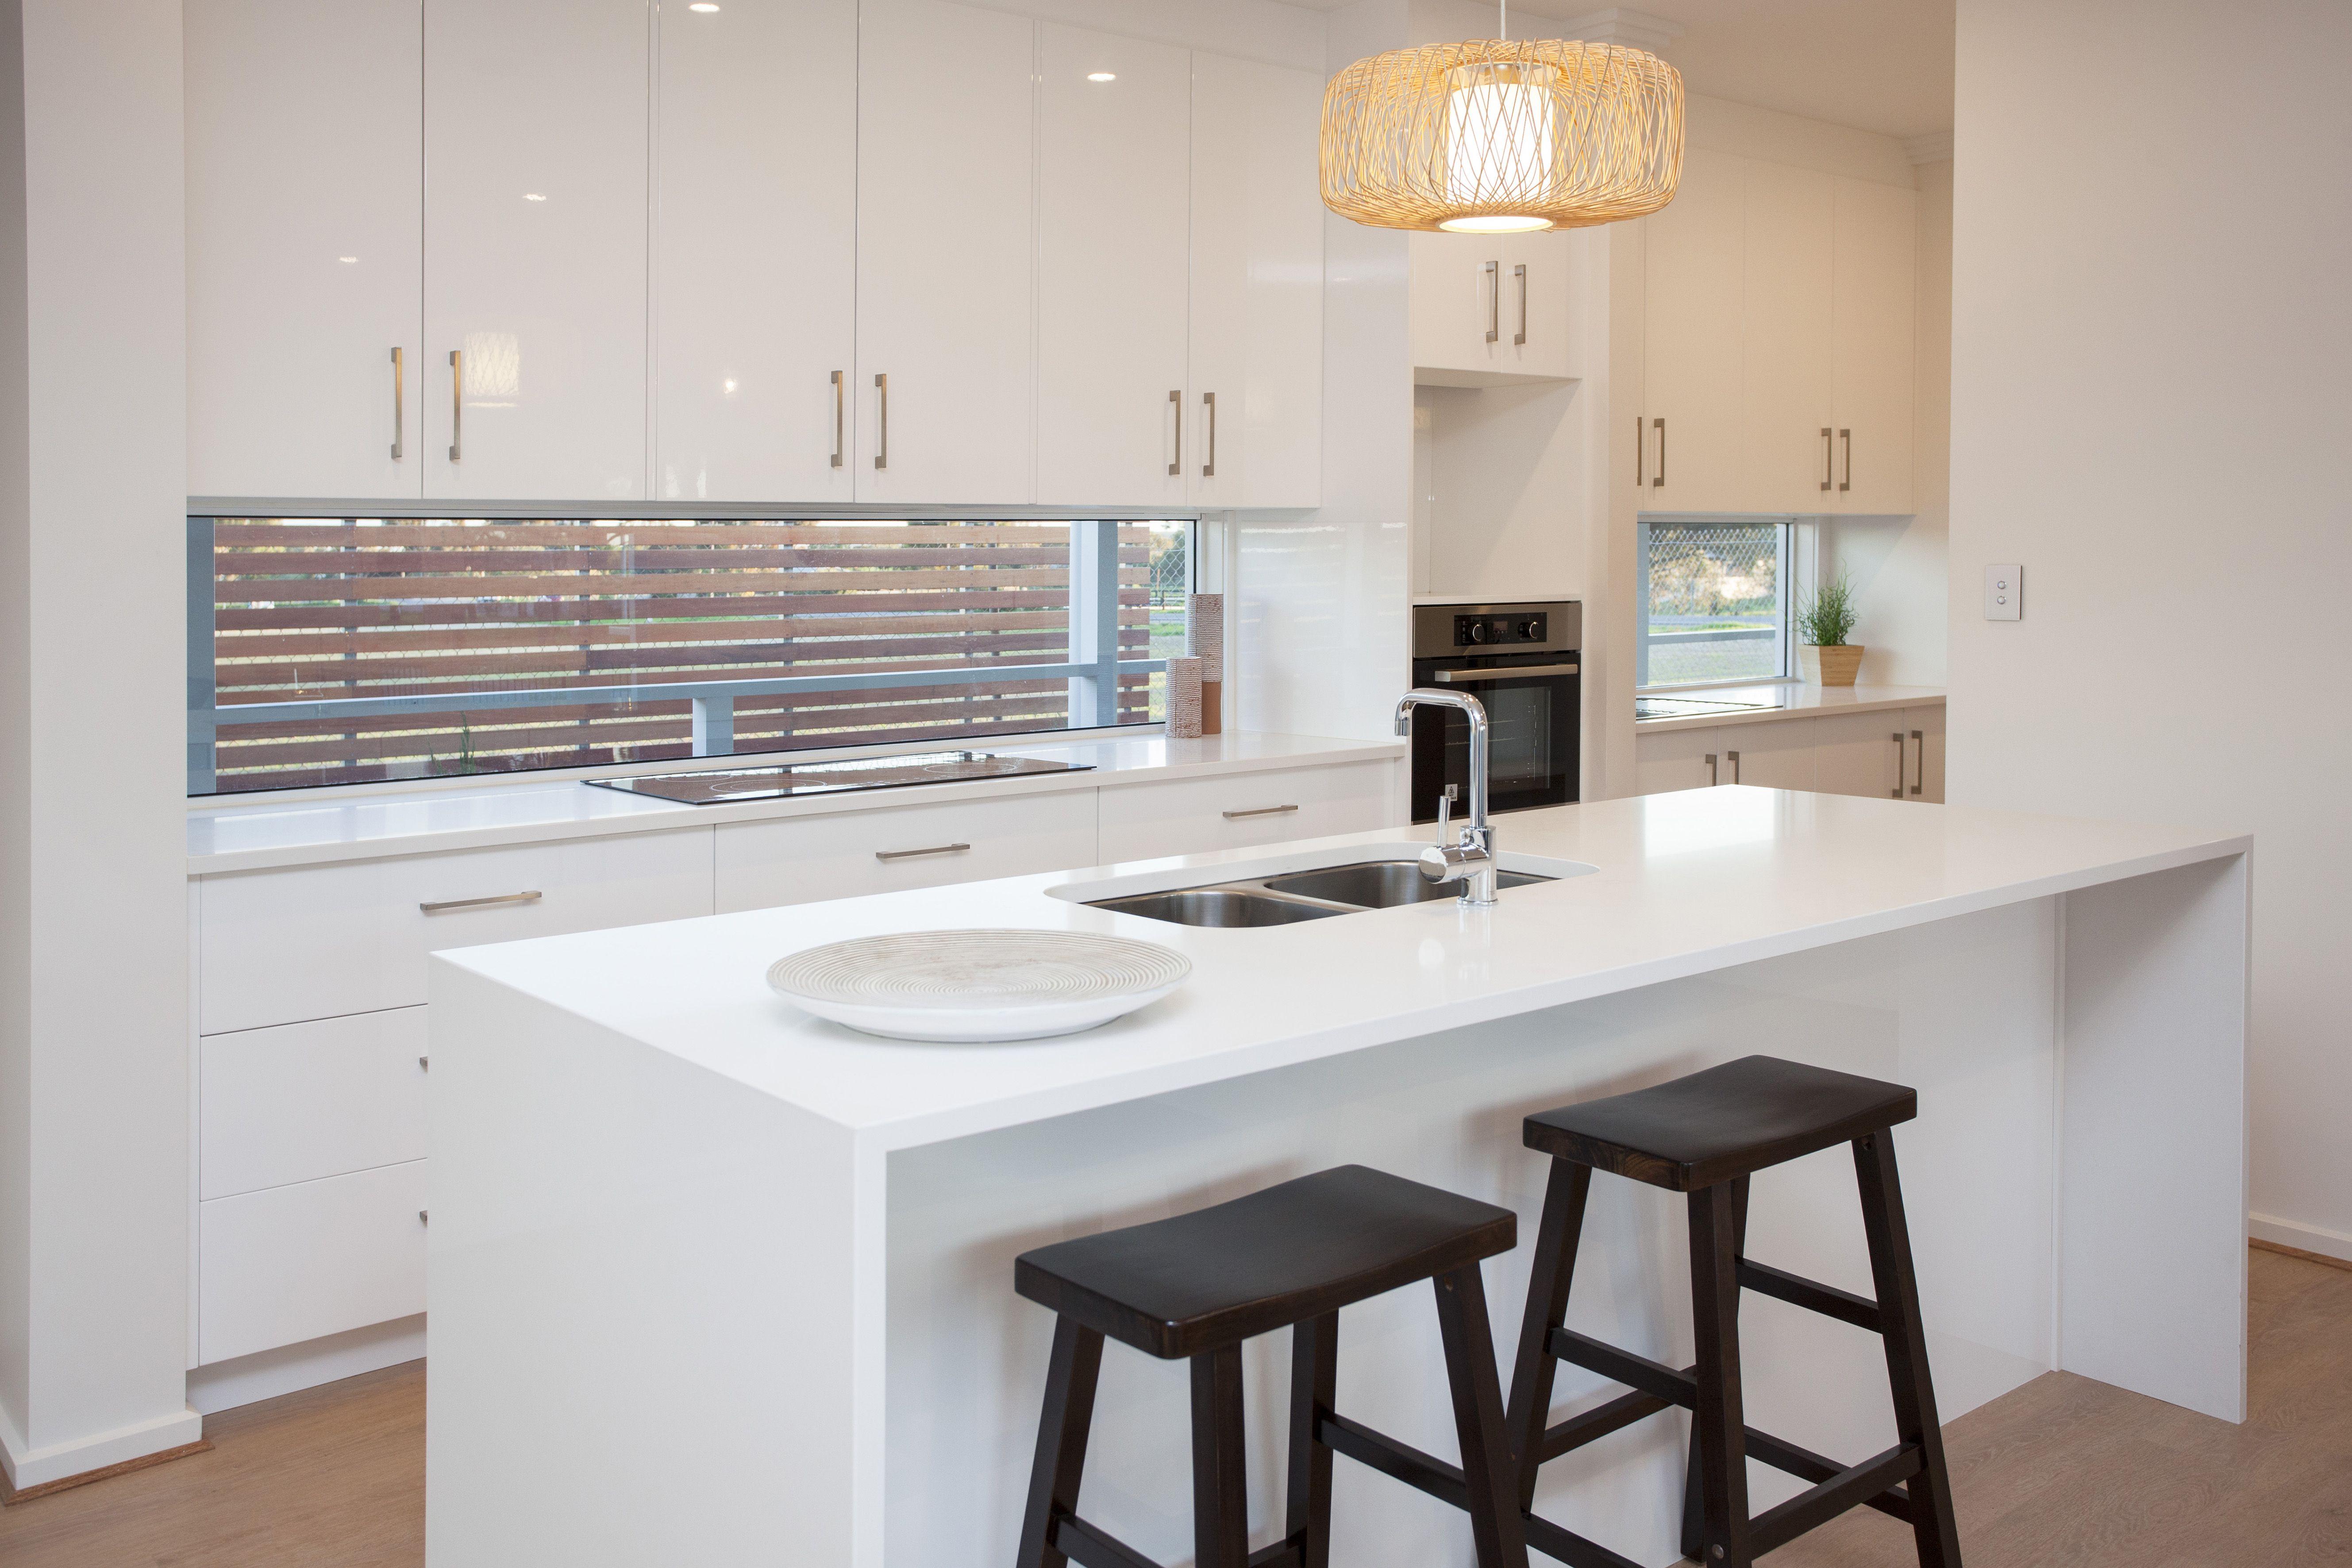 Kitchen Grand Kestrel Display homes, Kitchen design, Home